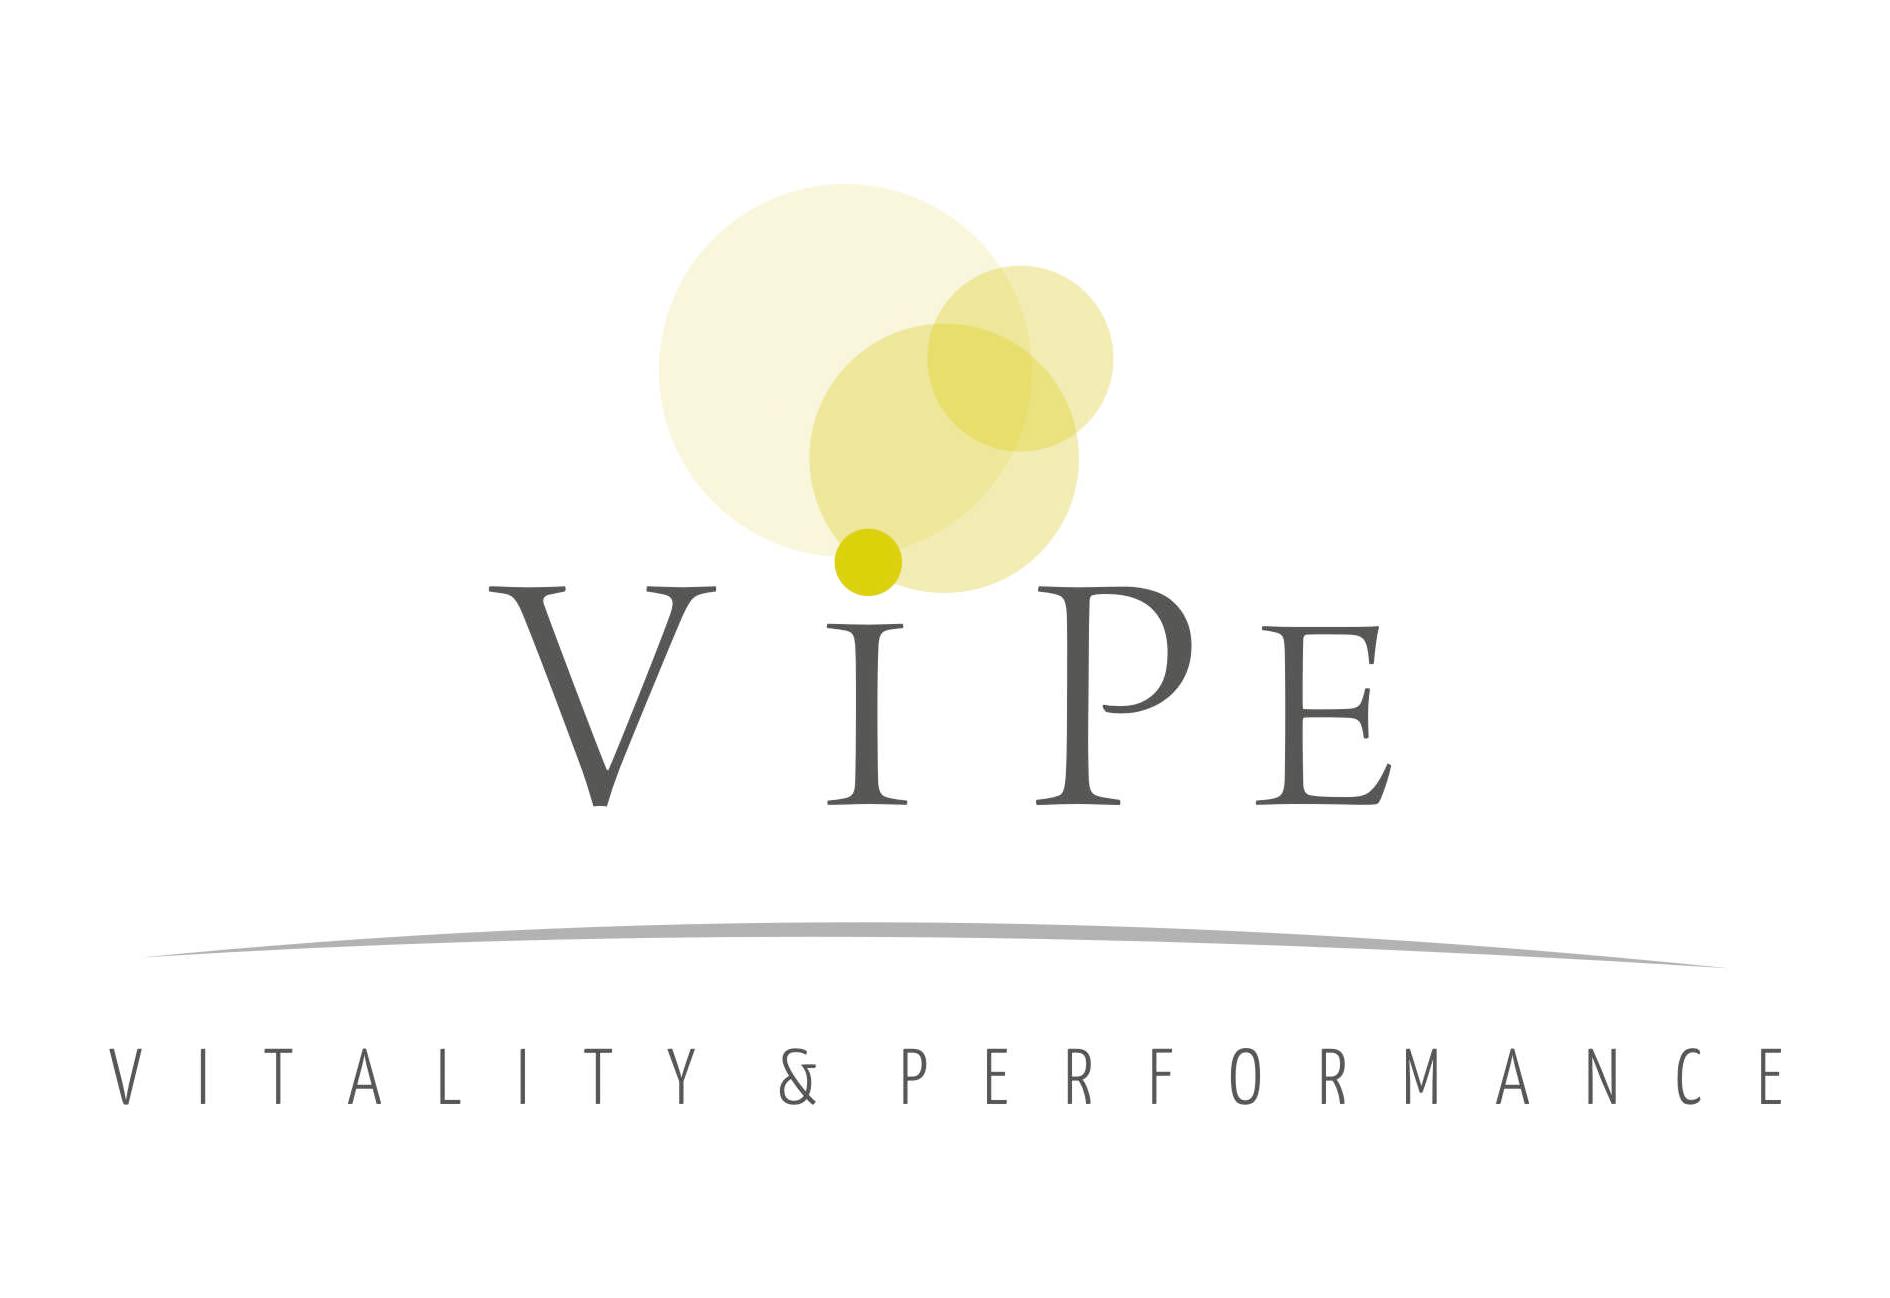 Vitality & Performance